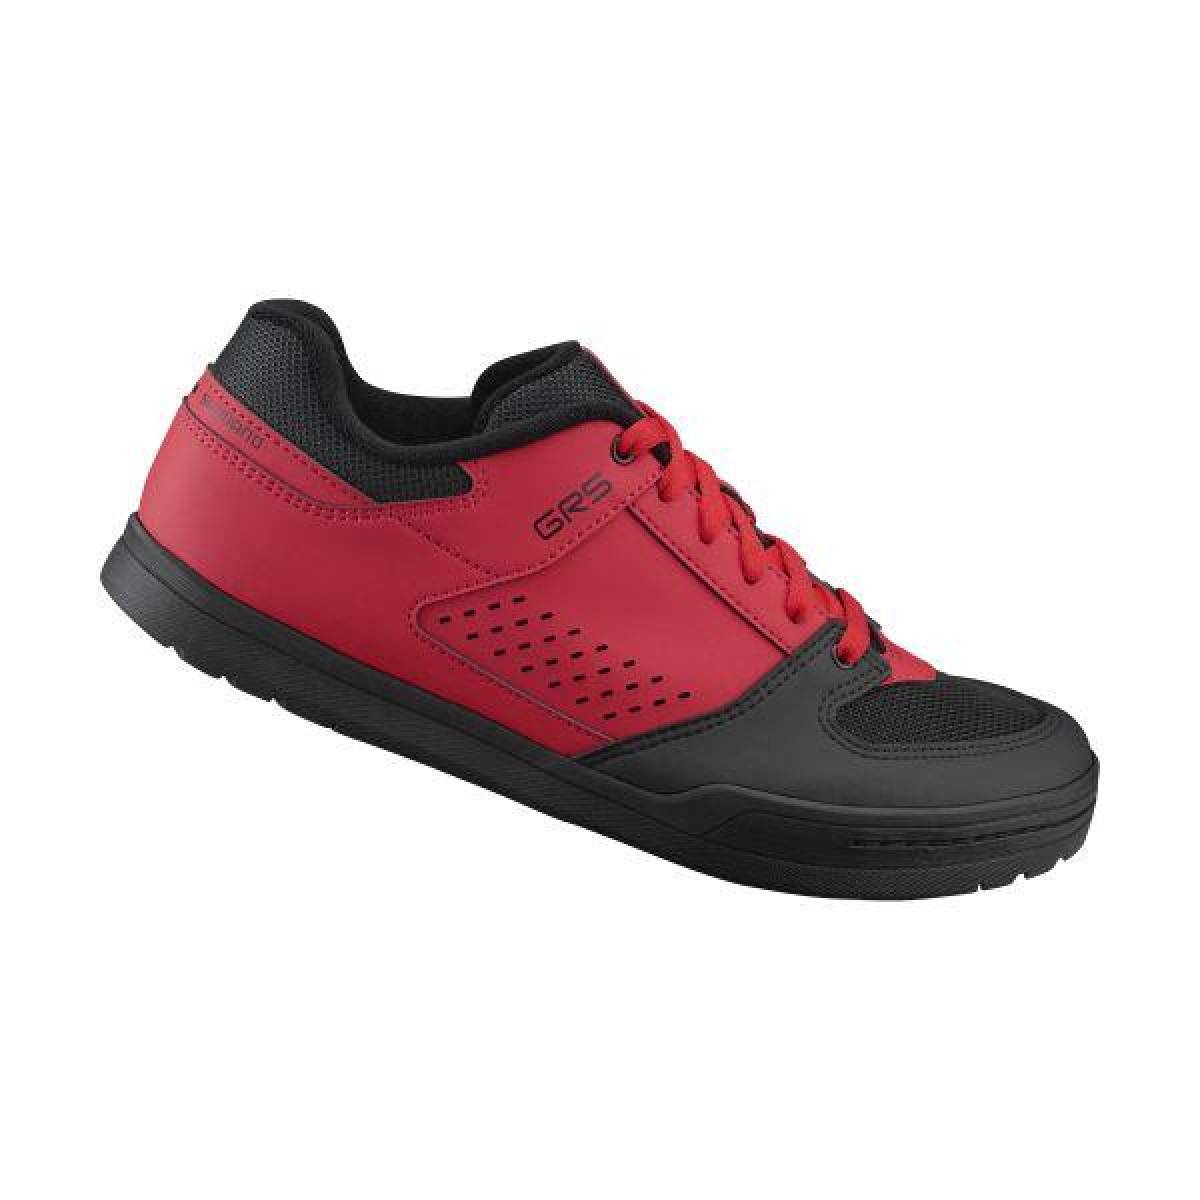 SHIMANO gravity obuv SH-GR500MR43, červená, 43